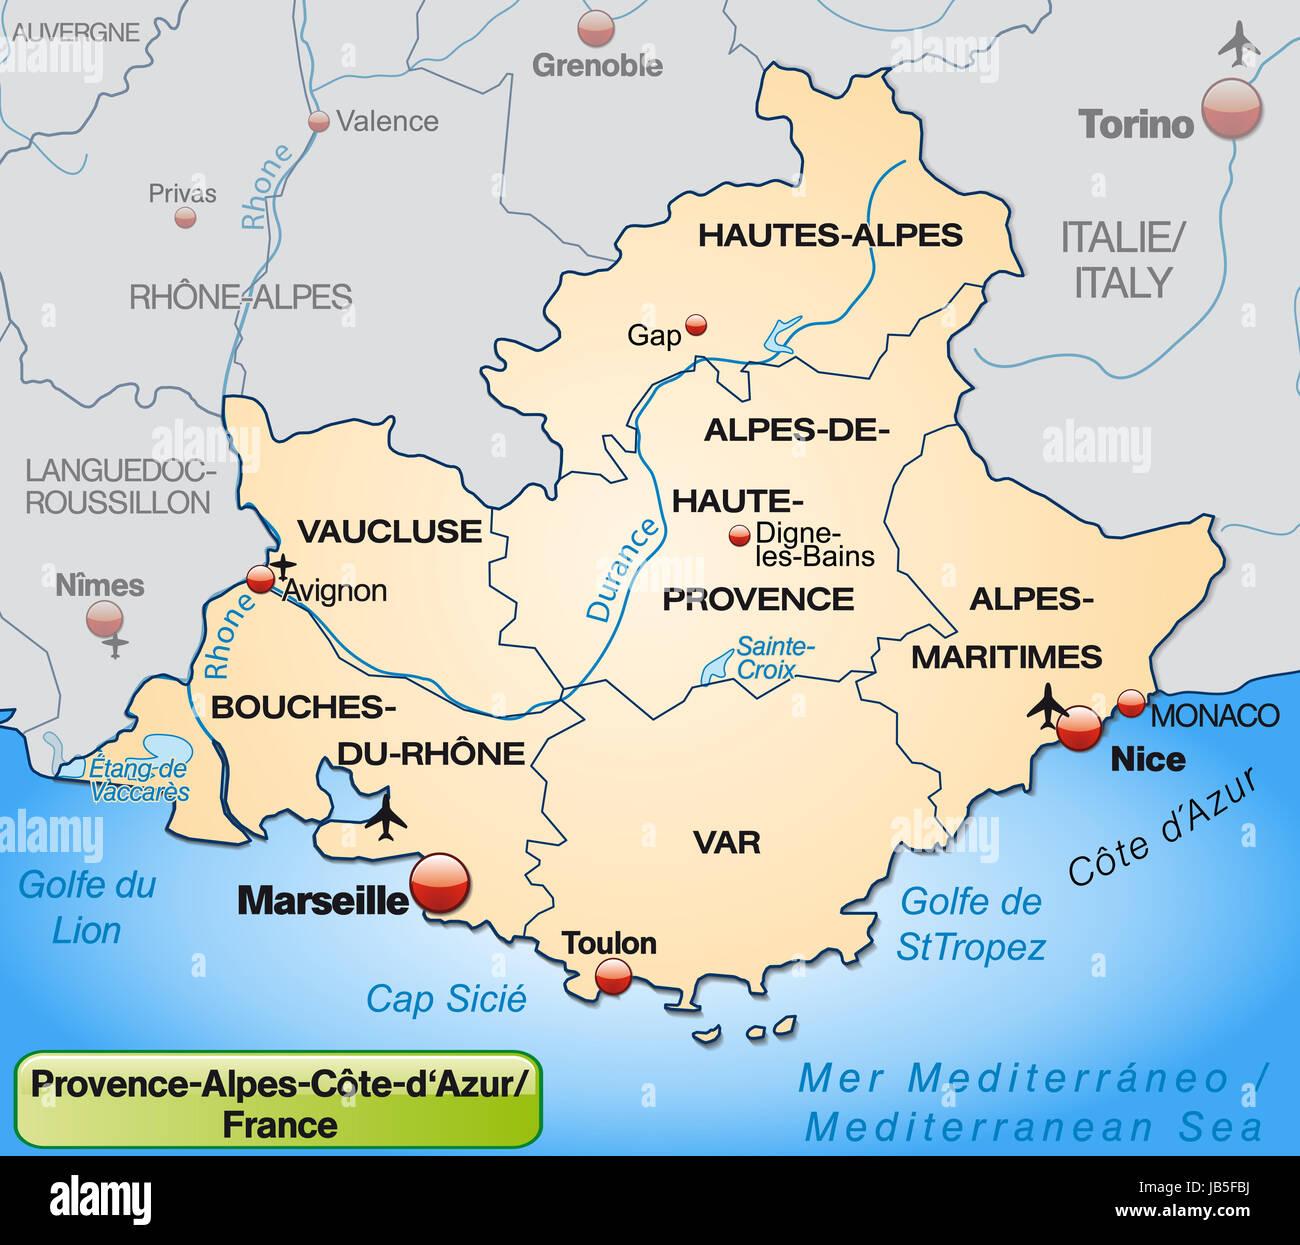 frankreich karte provence Provence Alpes Côte d ' Azur in Frankreich als Umgebungskarte Mit  frankreich karte provence